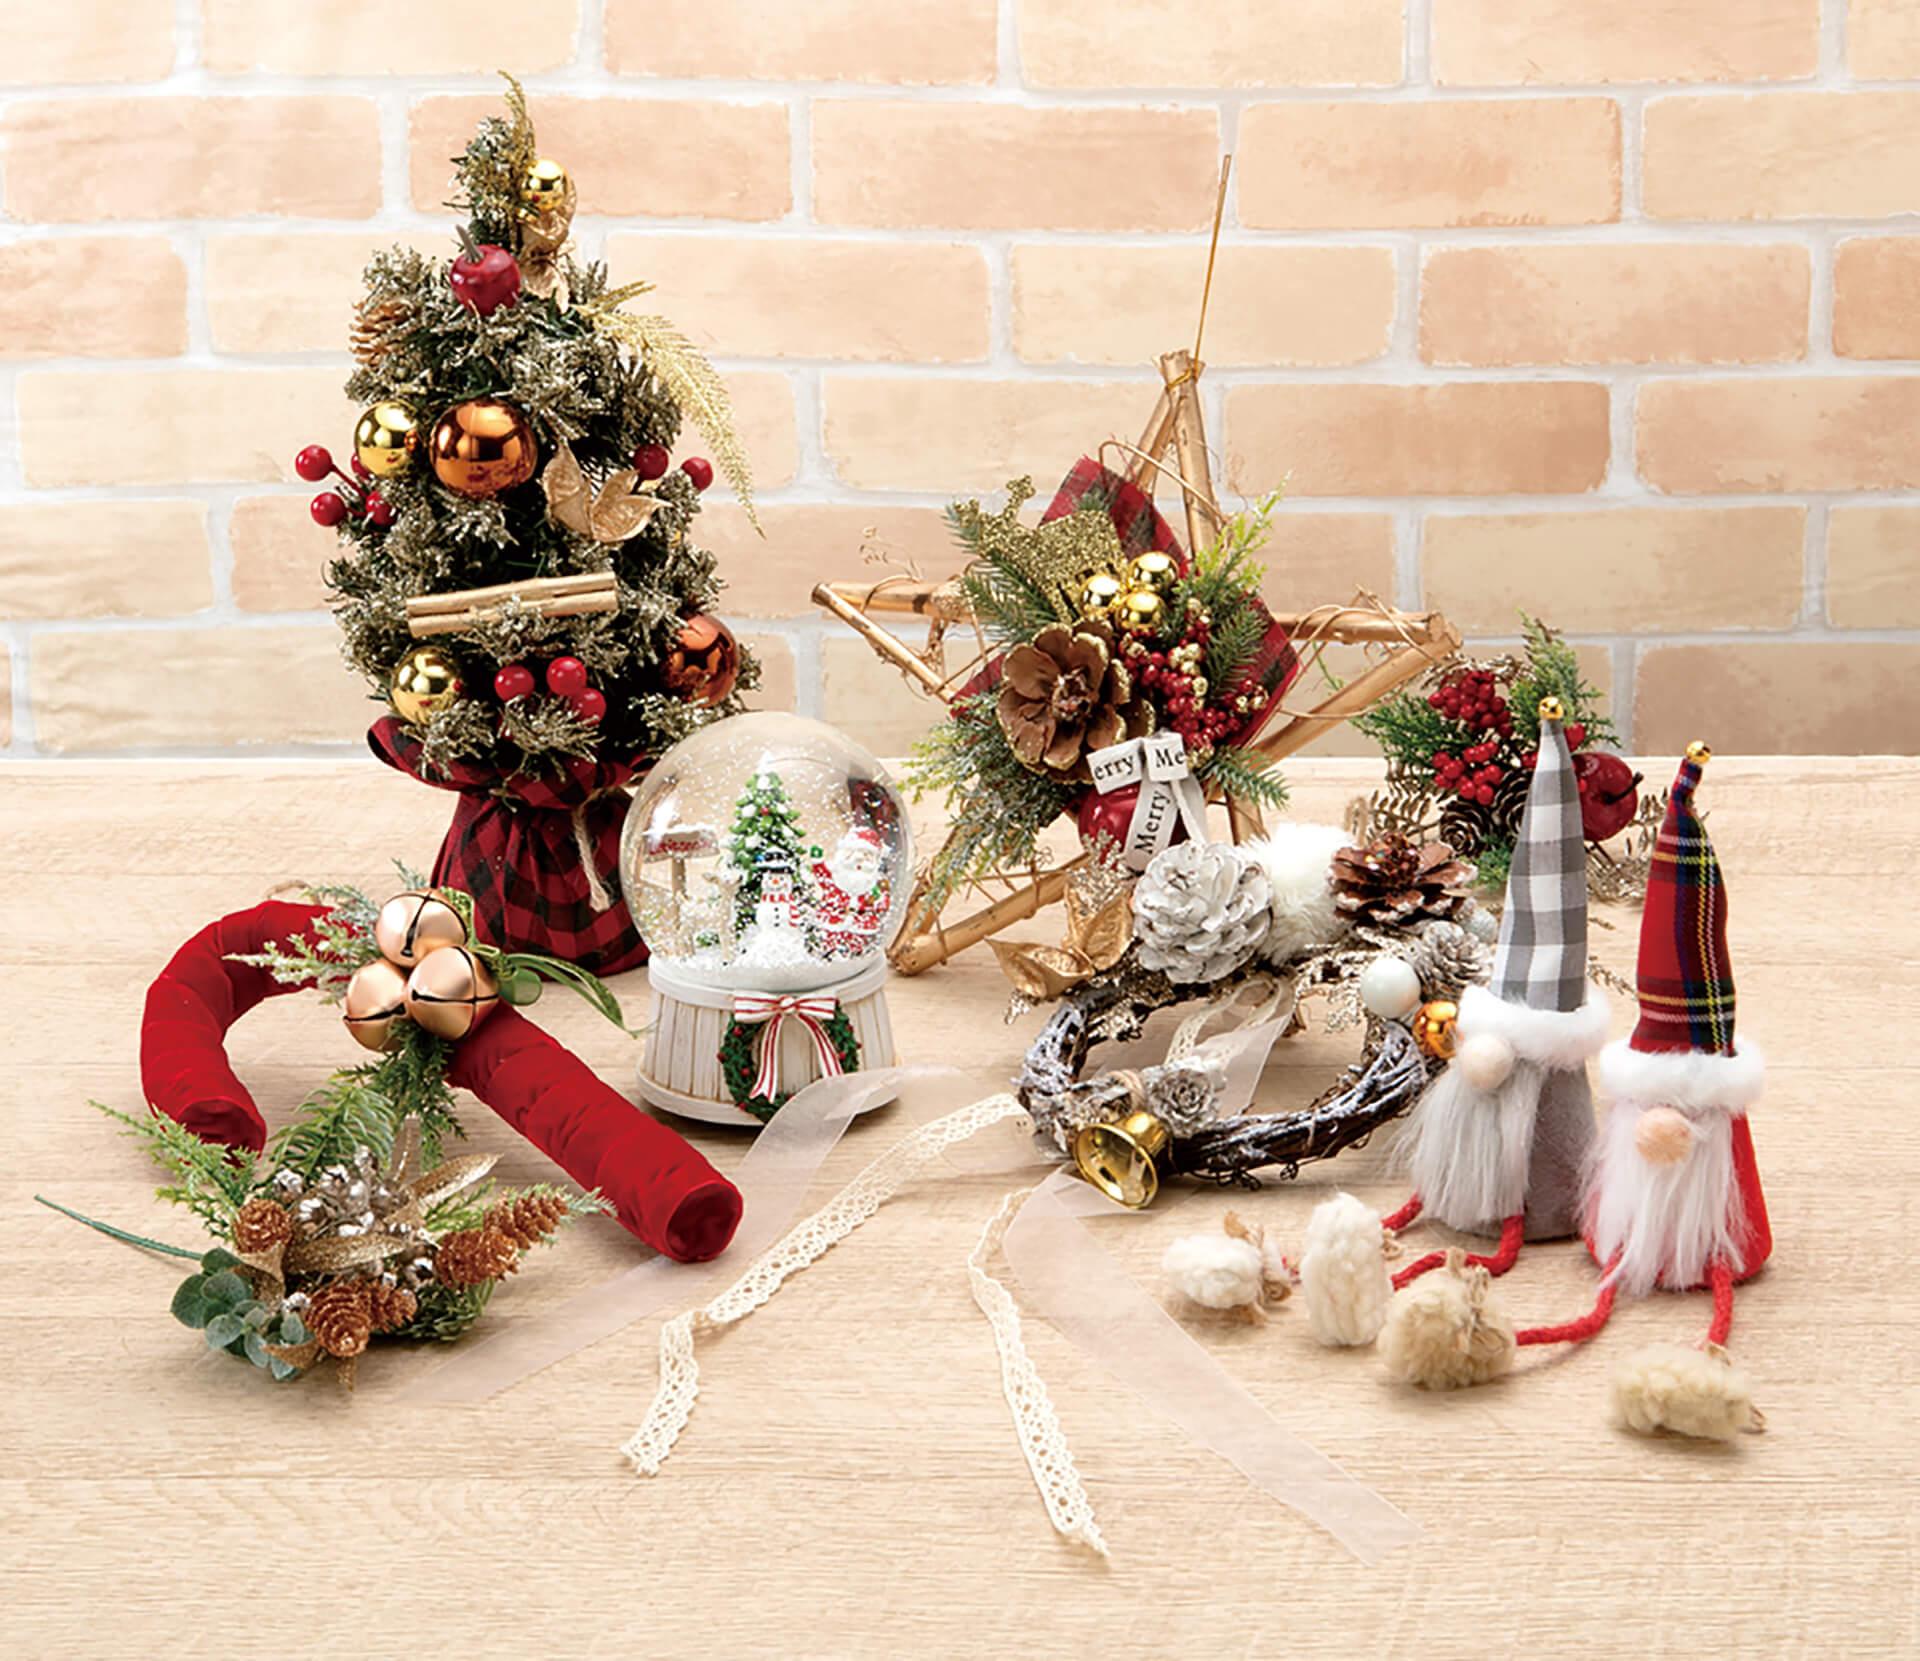 「GRAND <MARCHE> CHRISTMAS(グラン〈マルシェ〉クリスマス)~おとぎの国のクリスマス~」京急百貨店